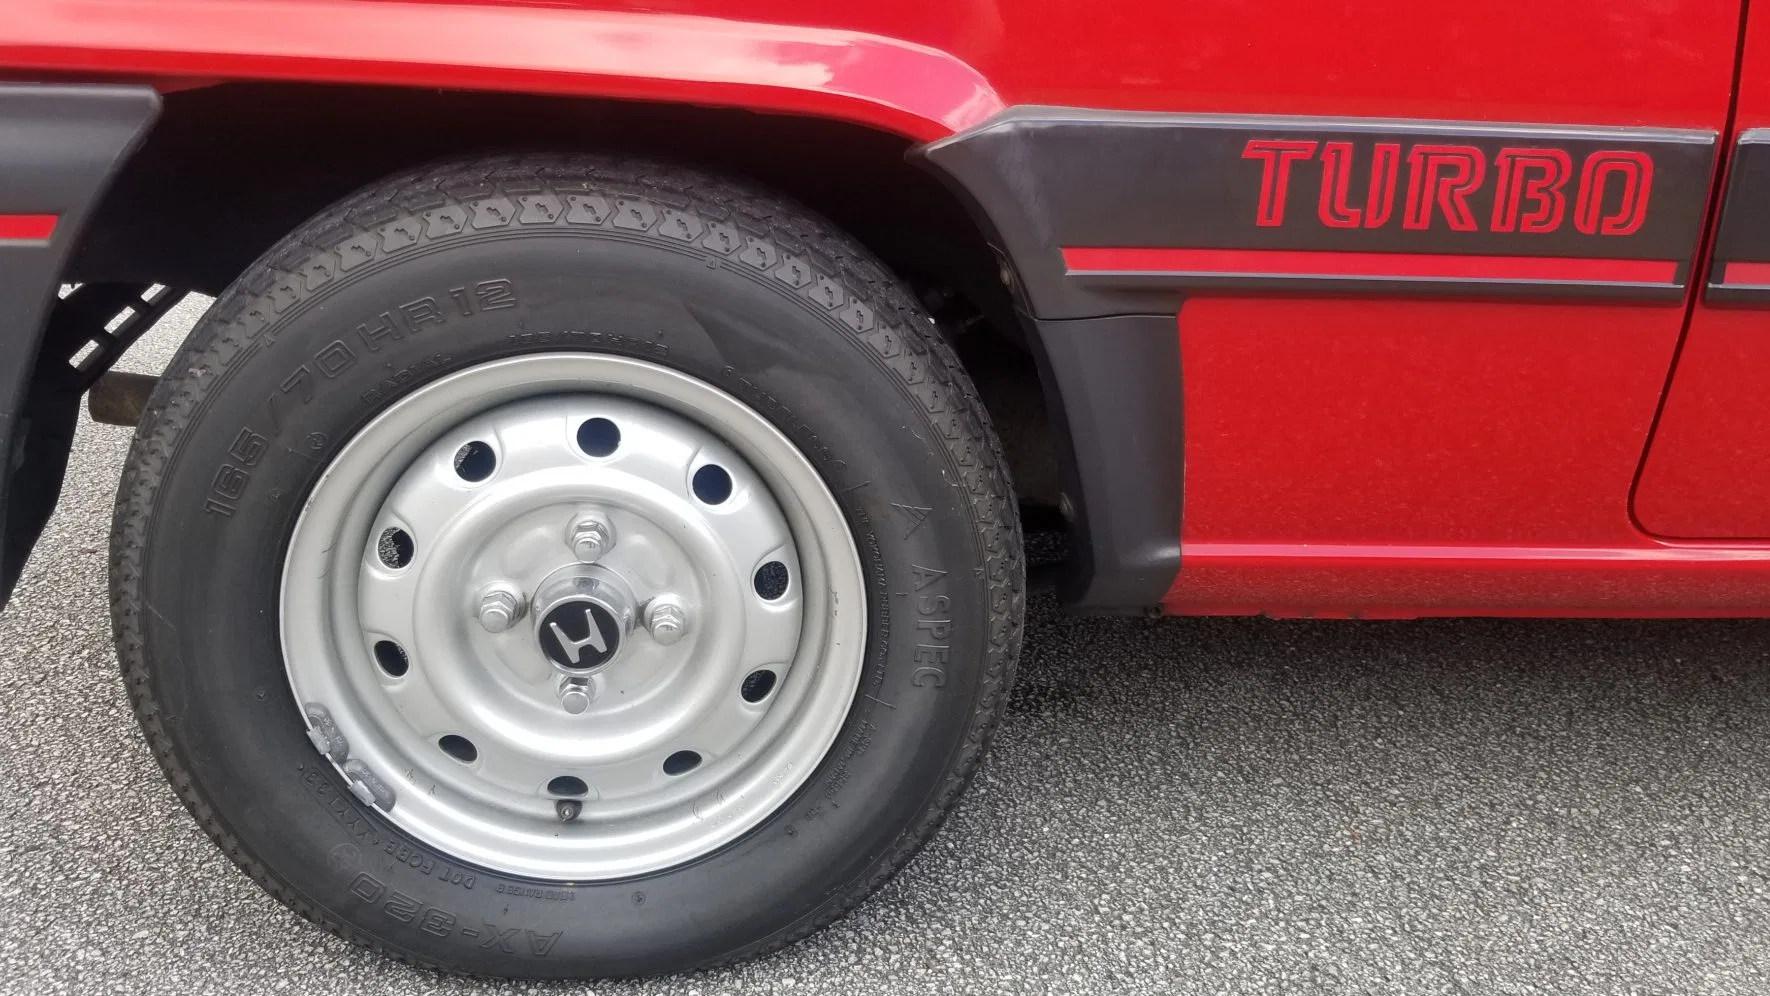 1983 Honda City Turbo driver's seat